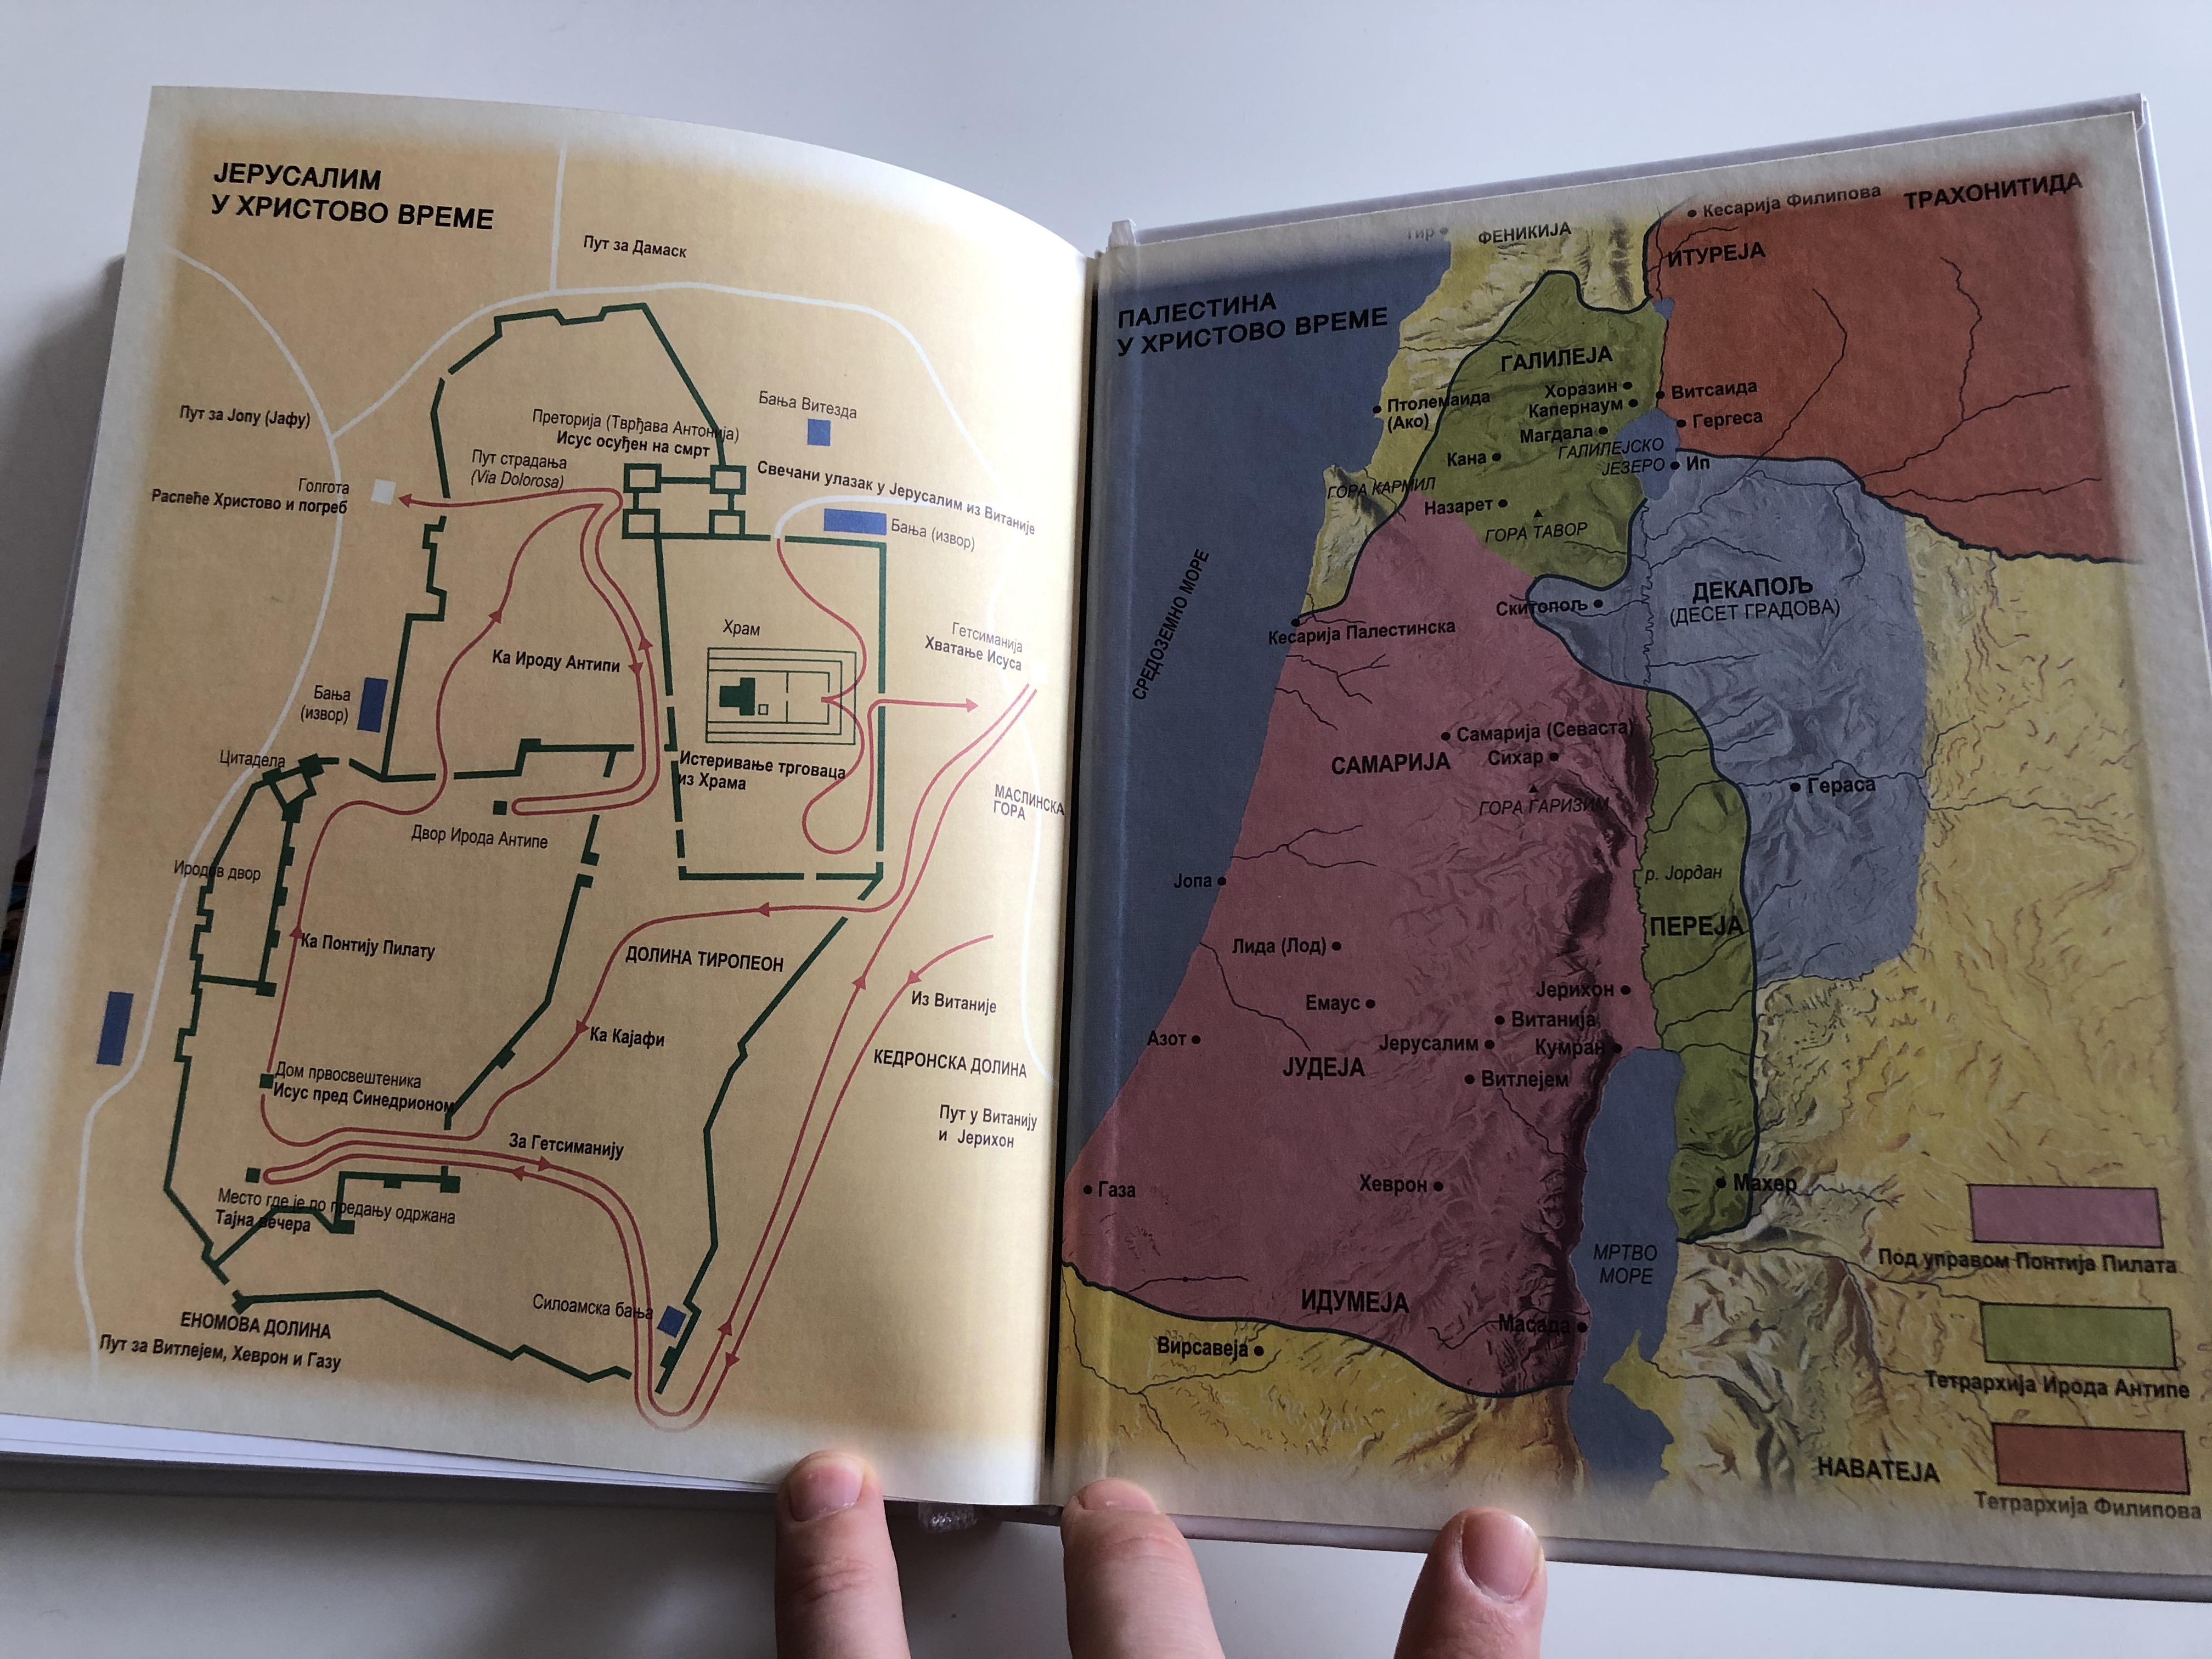 -by-marta-kapetanaku-ksinopulu-keti-hioteli-serbian-edition-of-children-s-bible-reader-16.jpg